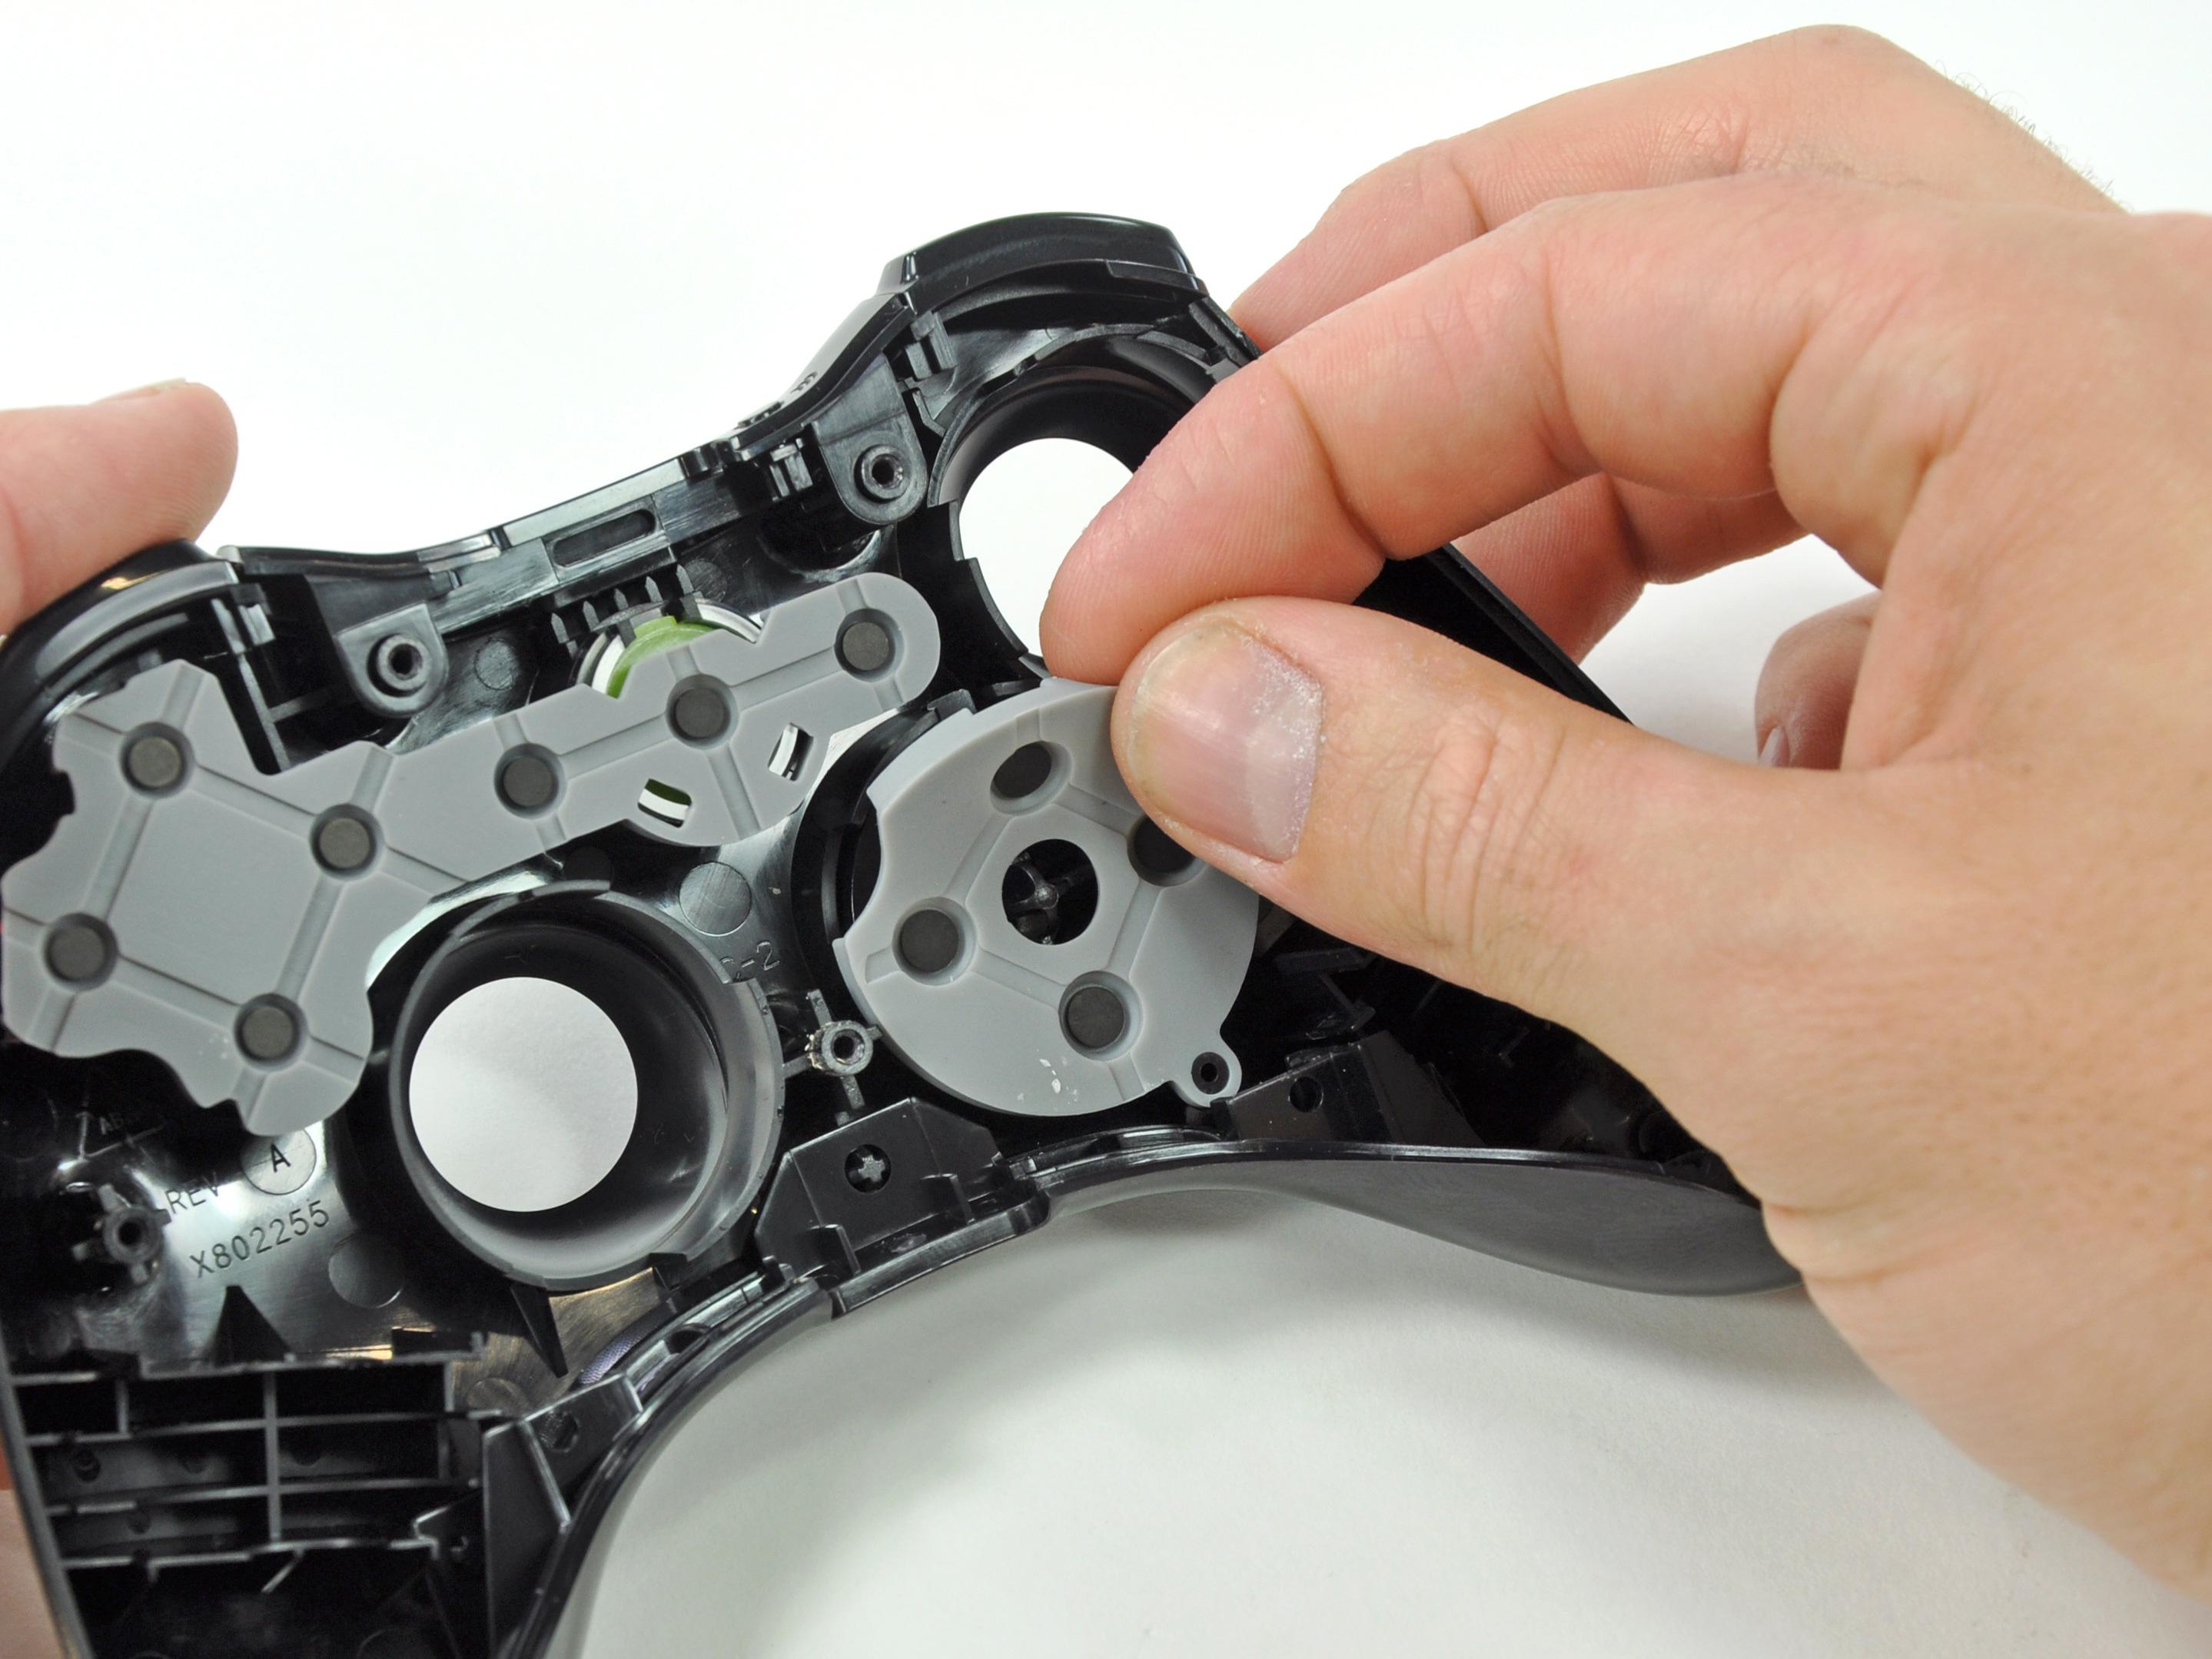 Xbox 360 Wireless Controller Repair - iFixit